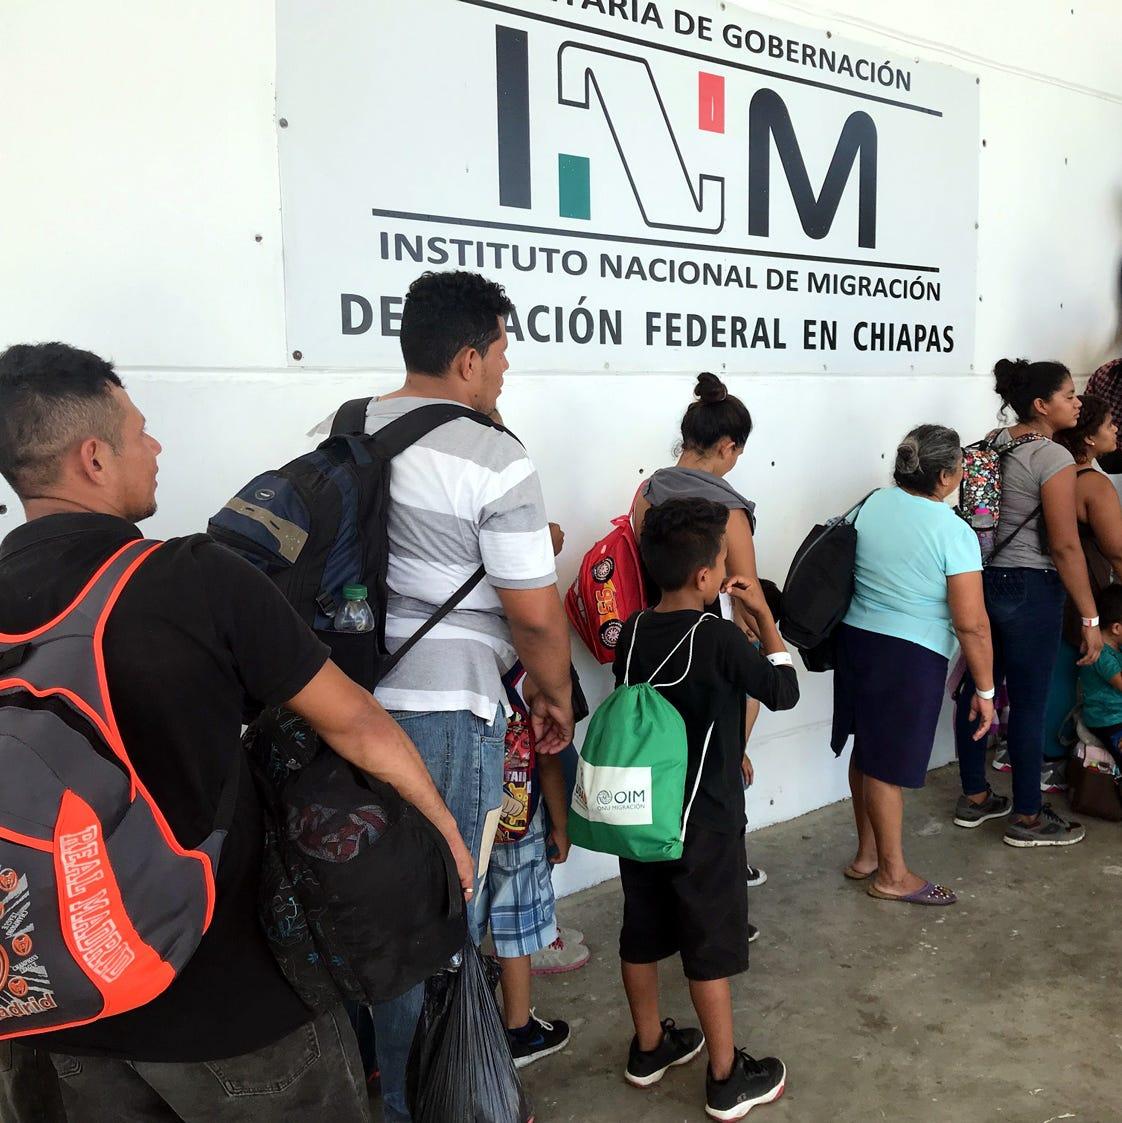 Se amparan migrantes contra deportaciónen México